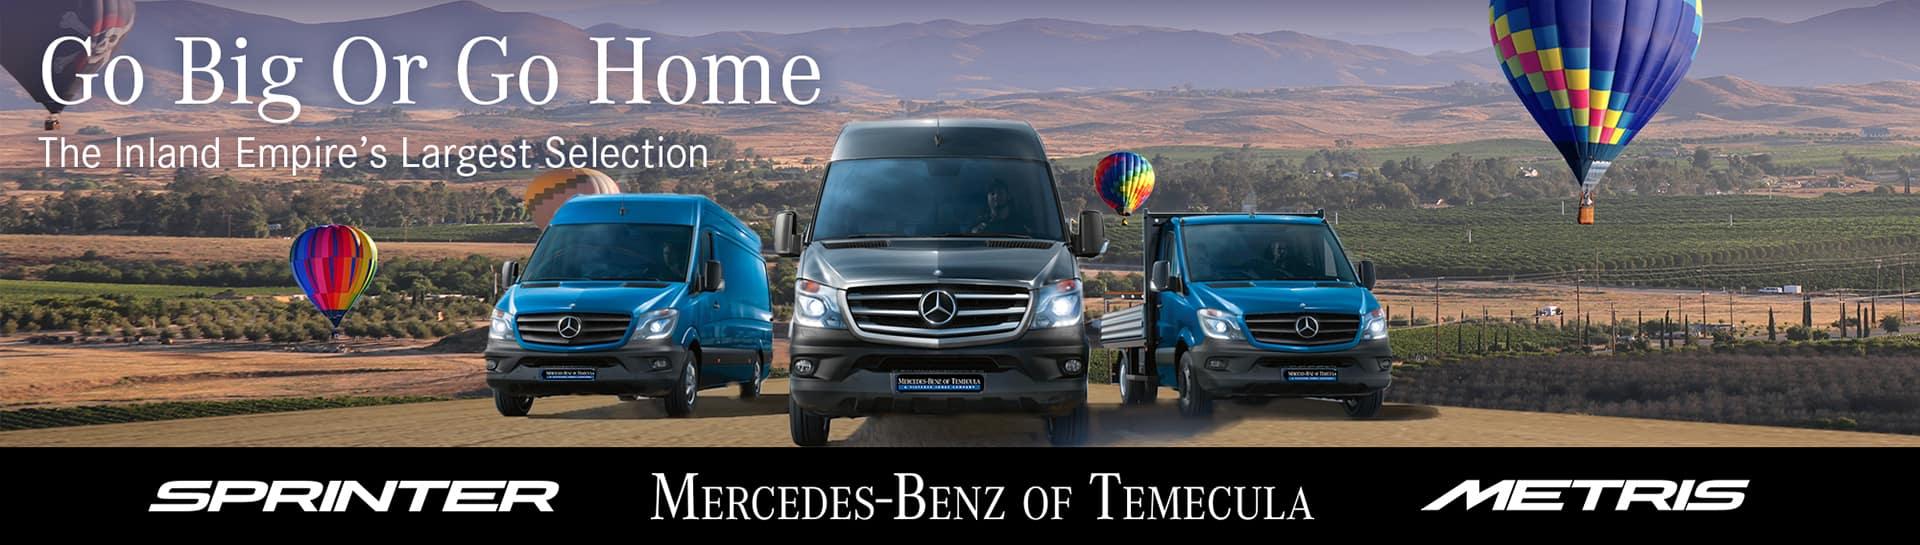 45 Sprinter Vans for Sale in Temecula | Mercedes-Benz of